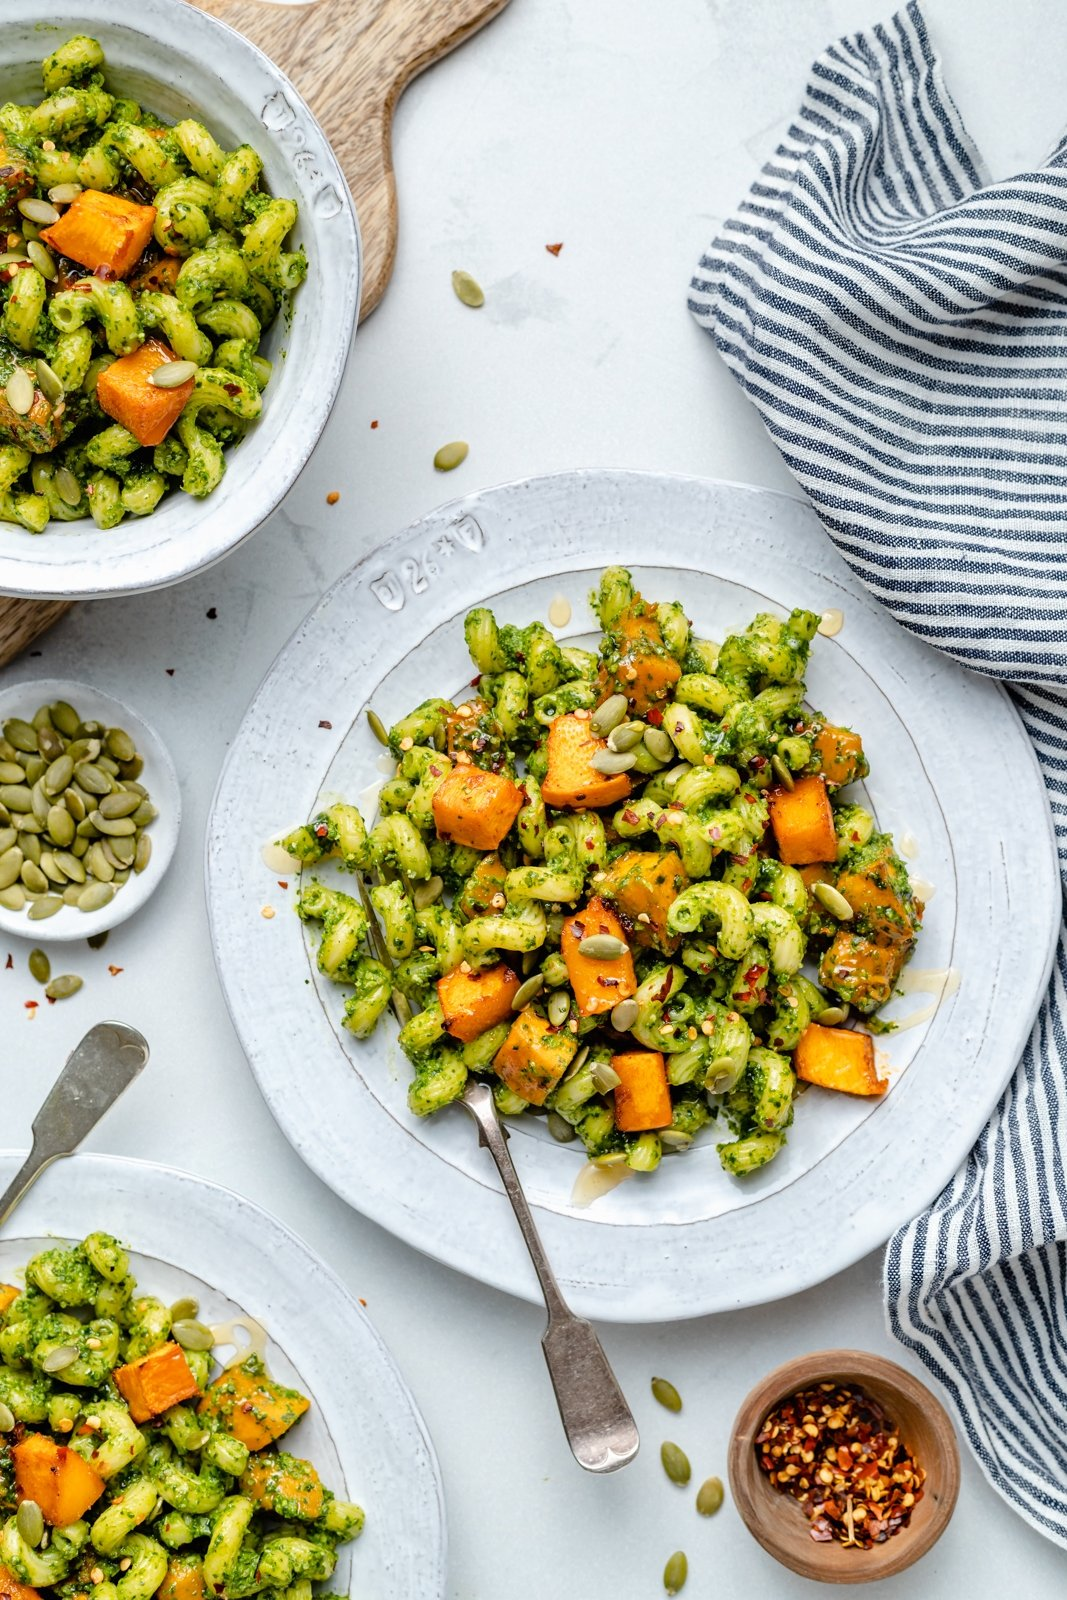 vegetarian cilantro pesto pasta on plates with roasted pumpkin